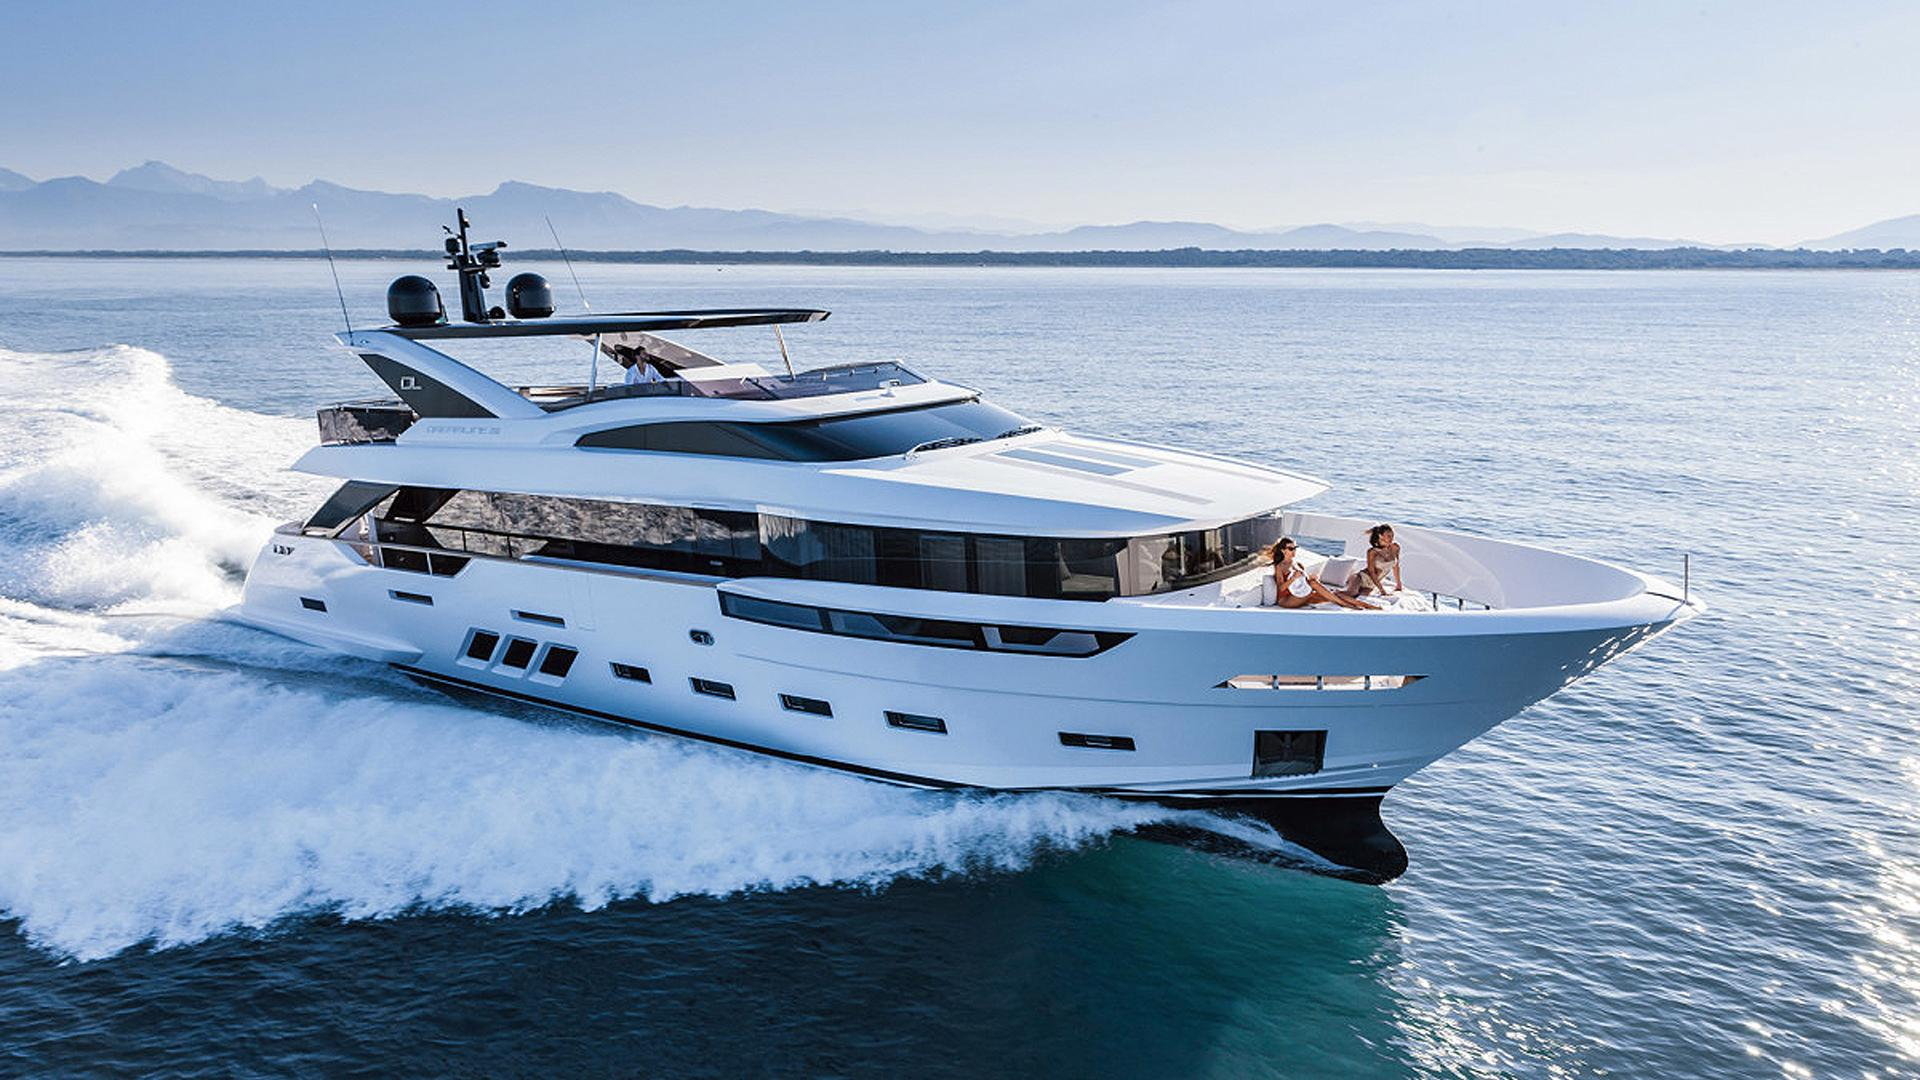 rokema motoryacht dl yachts 26m 2018 cruising sistership